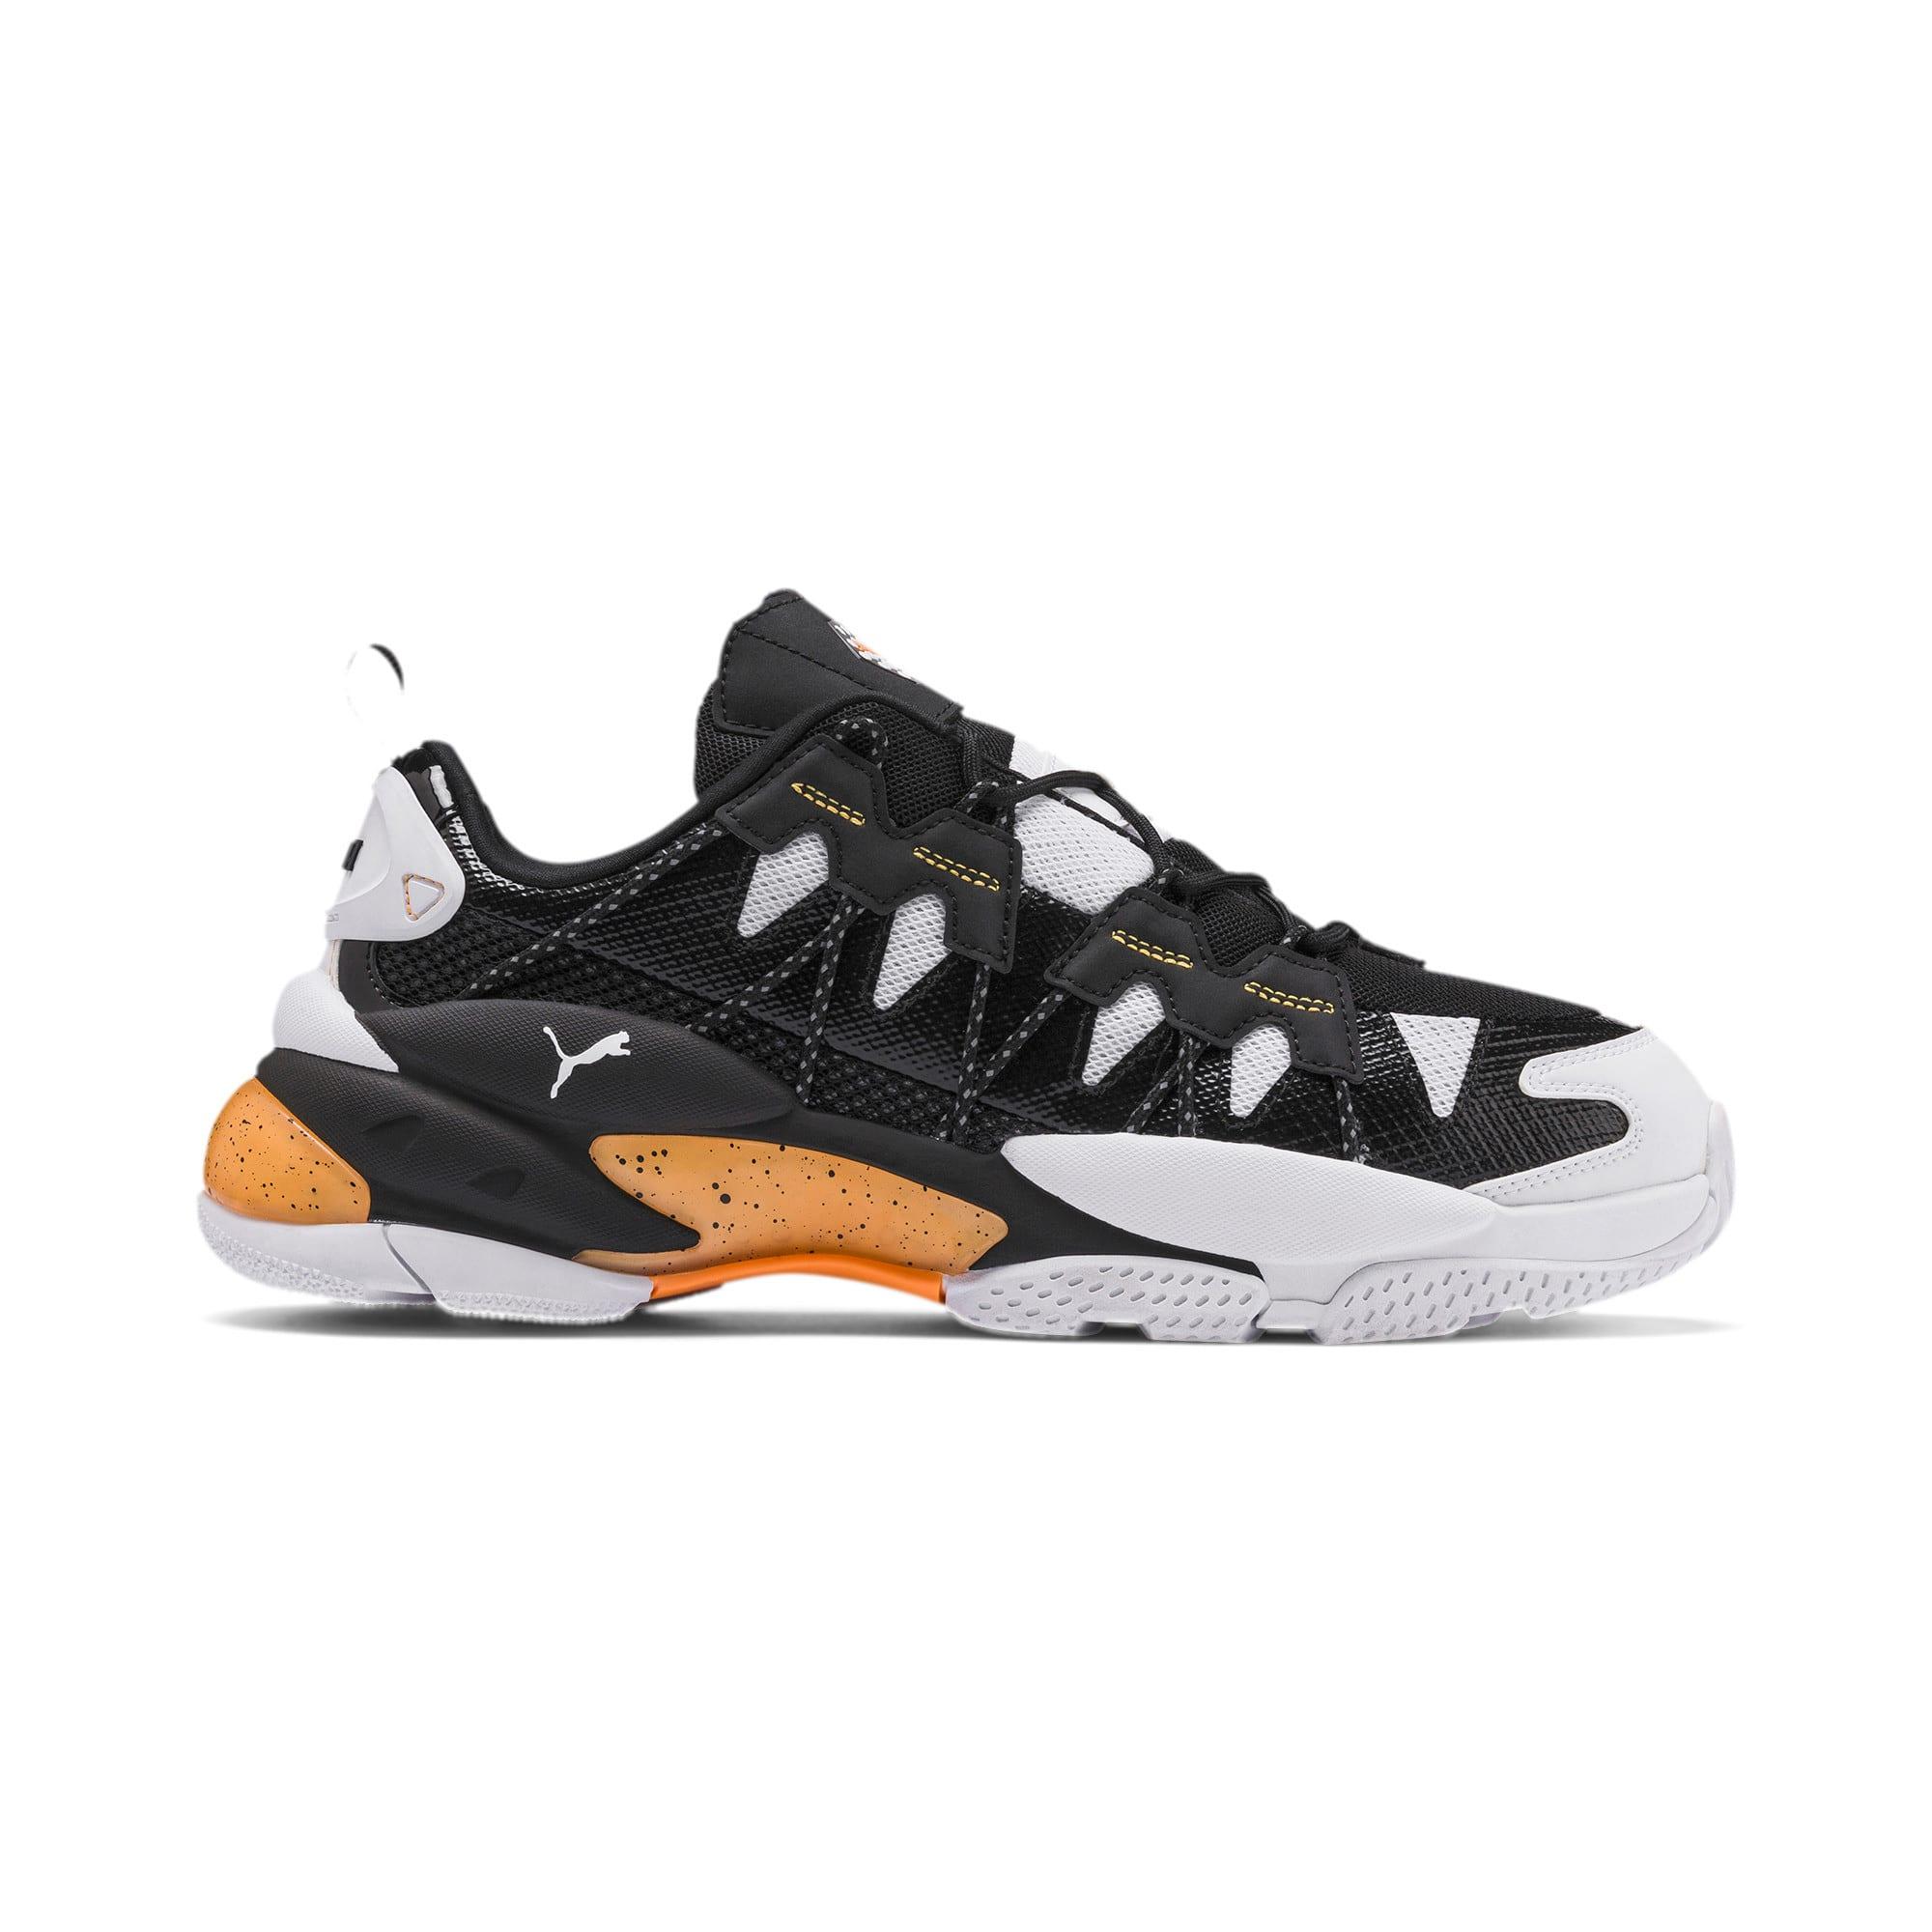 Thumbnail 5 of LQDCELL Omega Density Sneakers, Puma White-Puma Black, medium